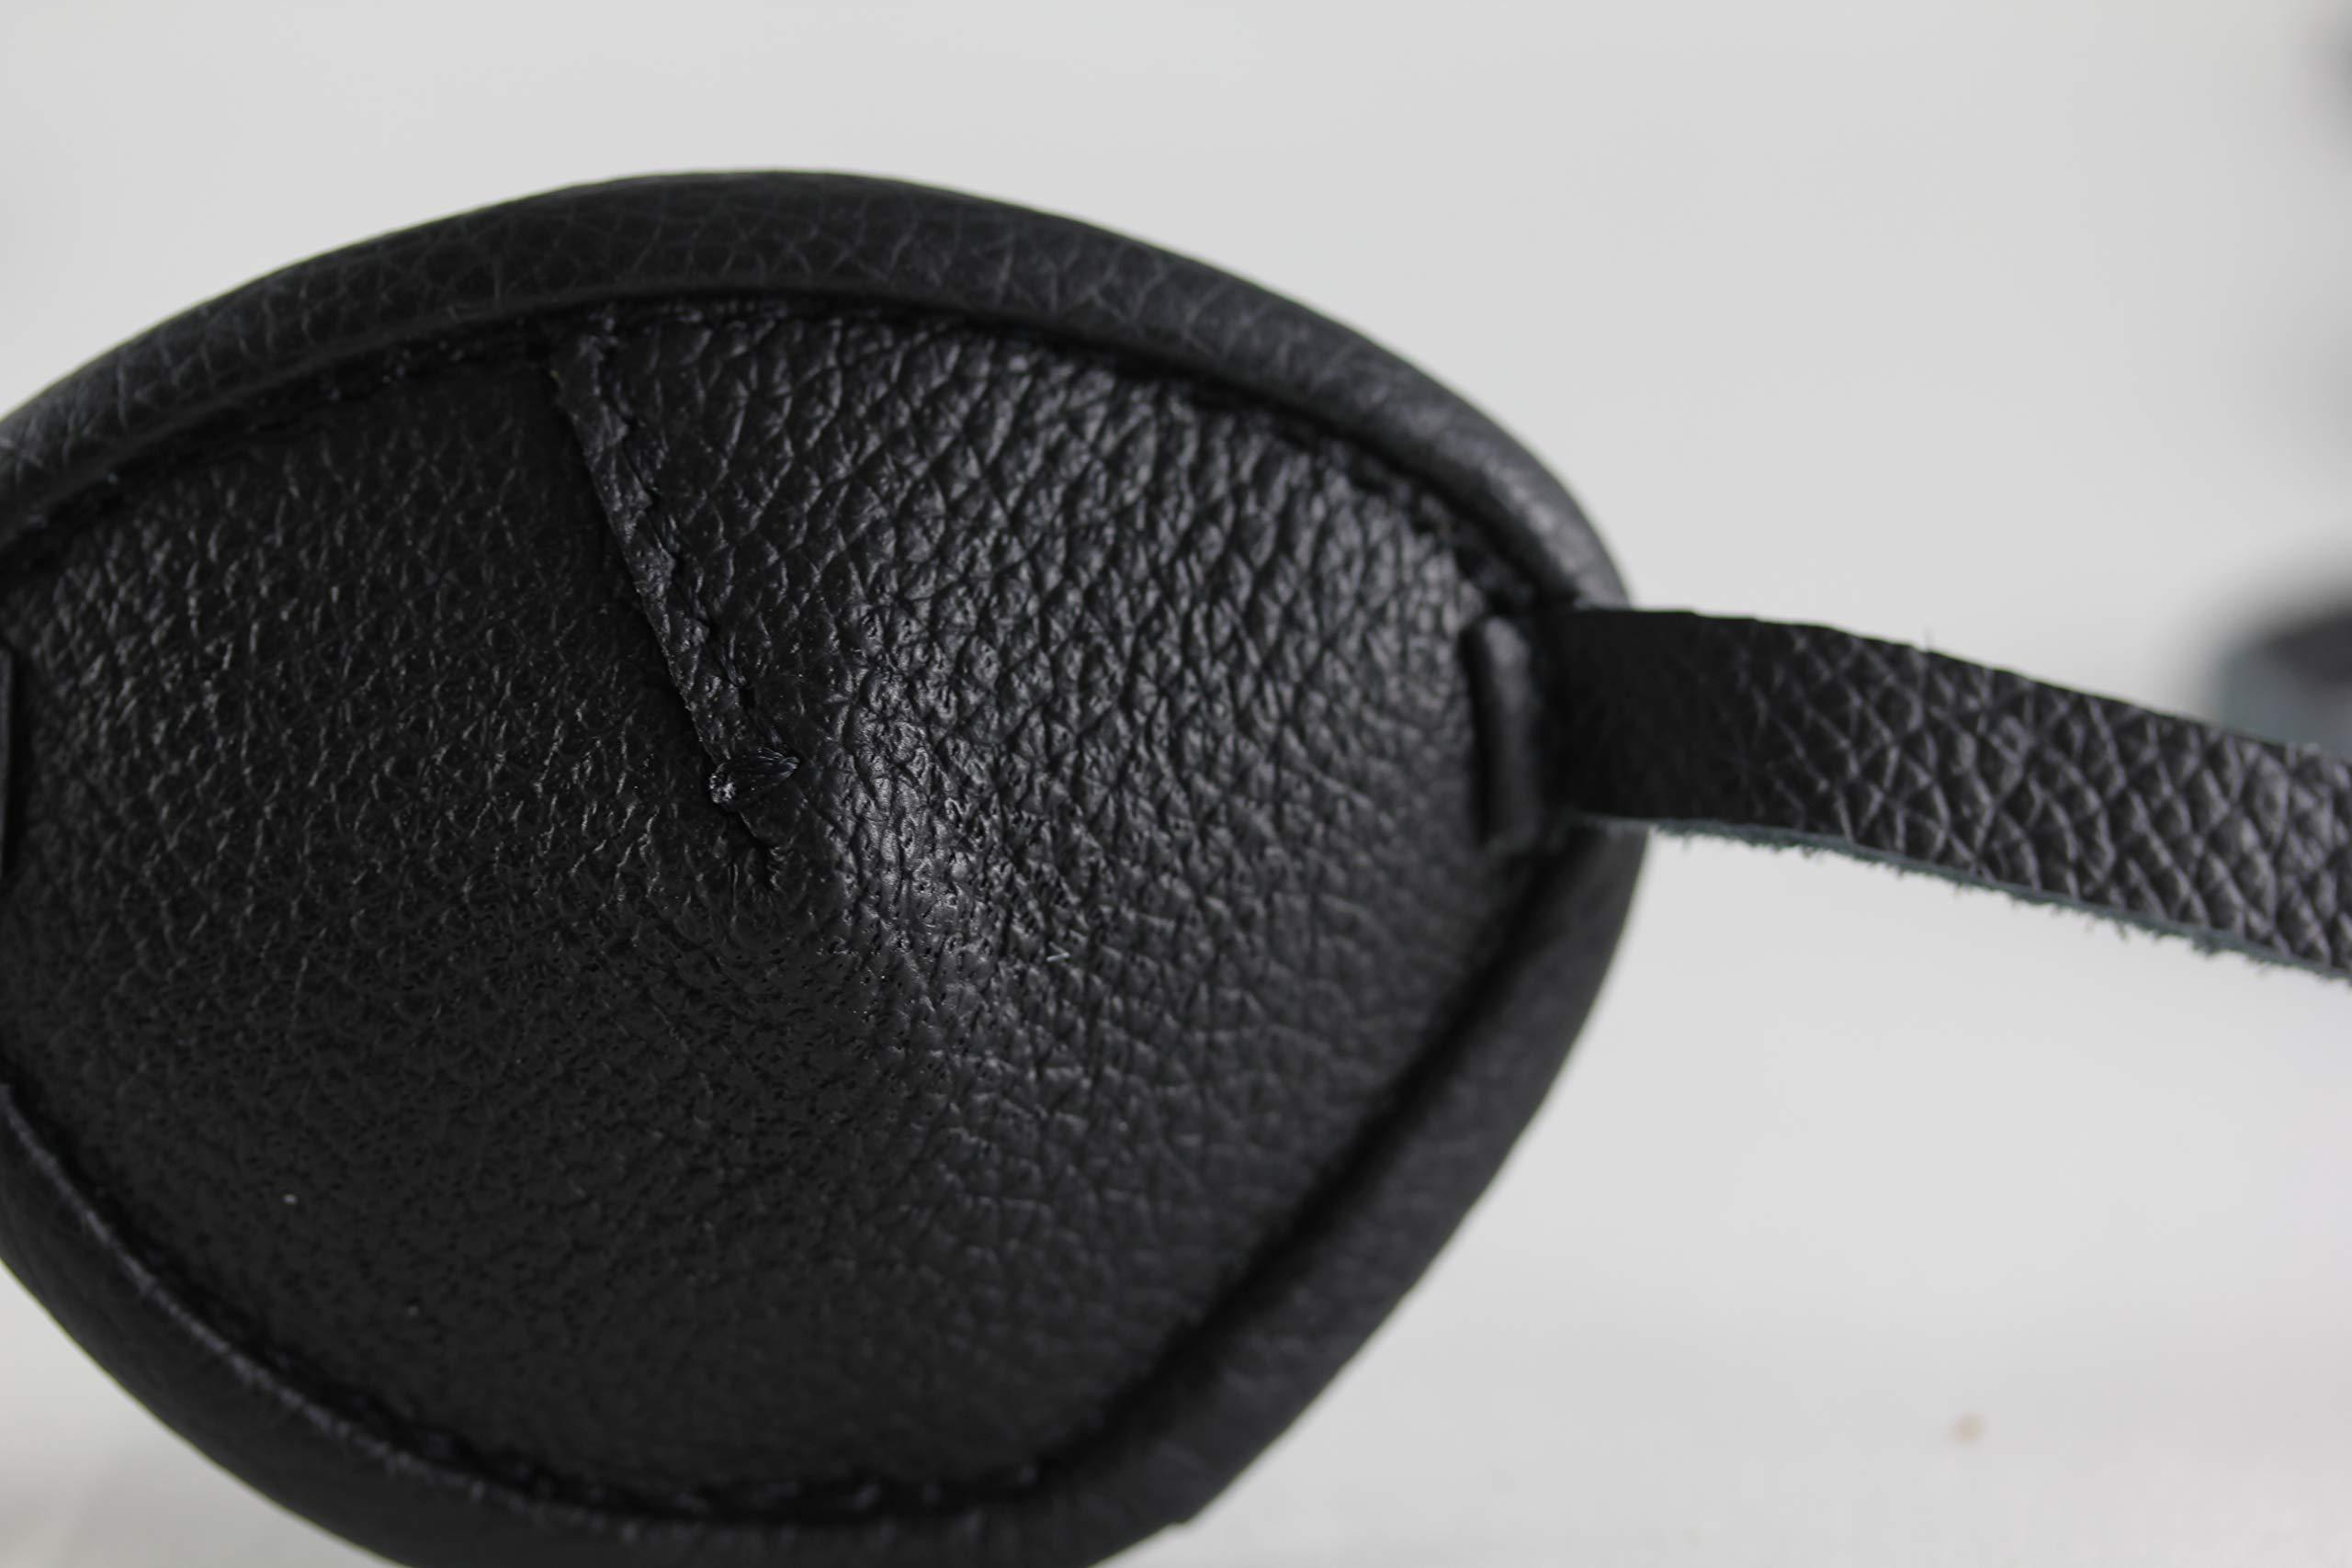 Leather Eyepatch. Slight Convex Eye Patch (Right Eye, Full Size Black) by Desantis Leather Goods (Image #6)